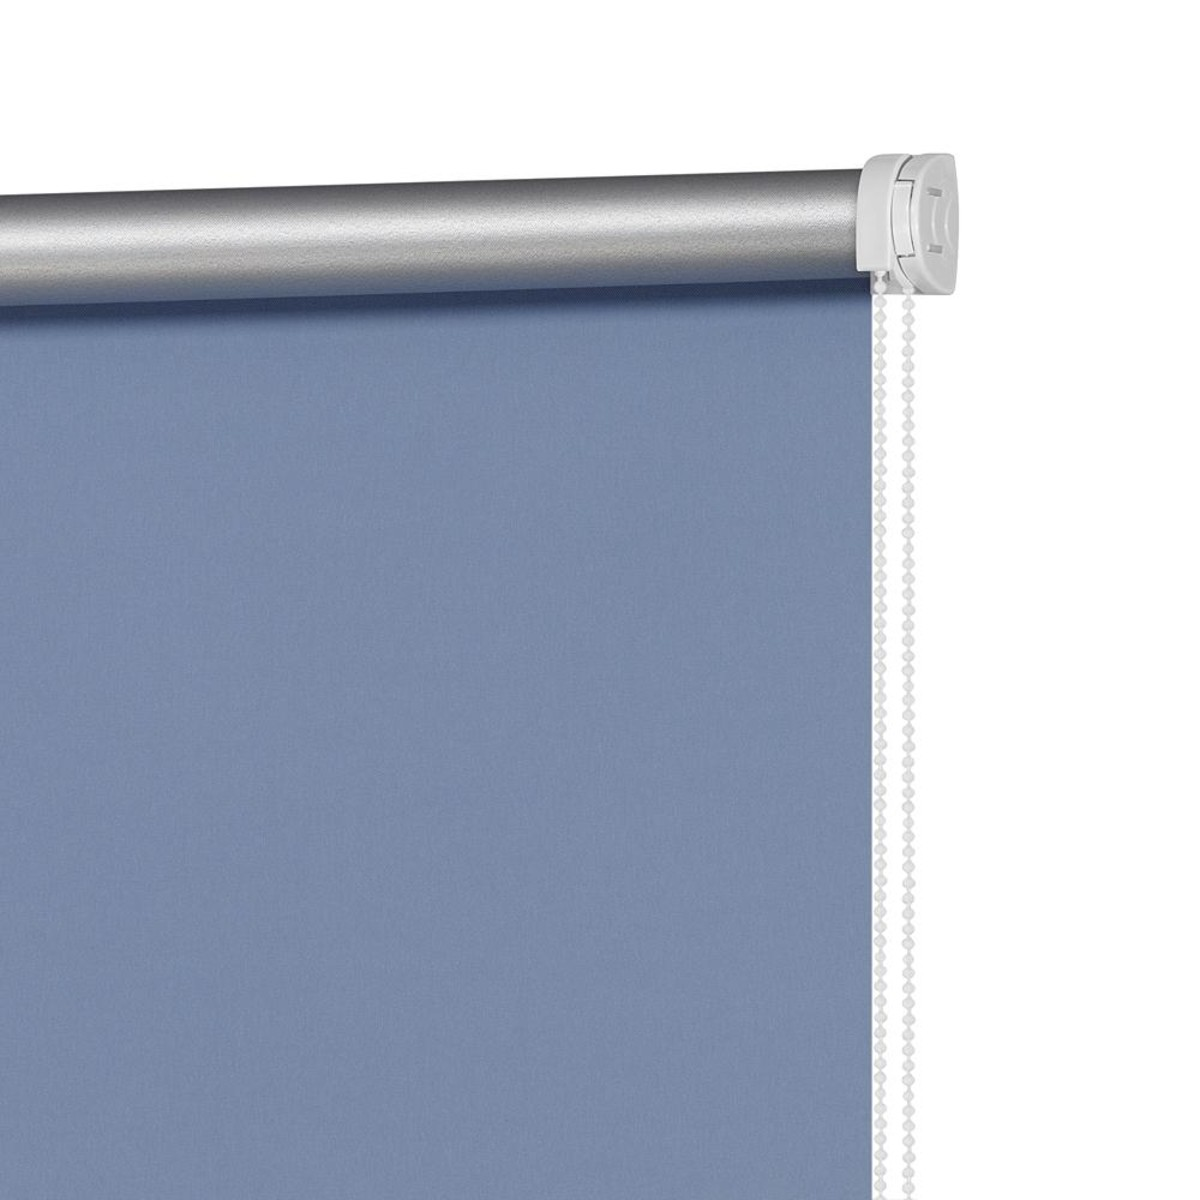 Рулонная Ора Decofest Блэкаут Плайн 140Х175 Цвет Синий